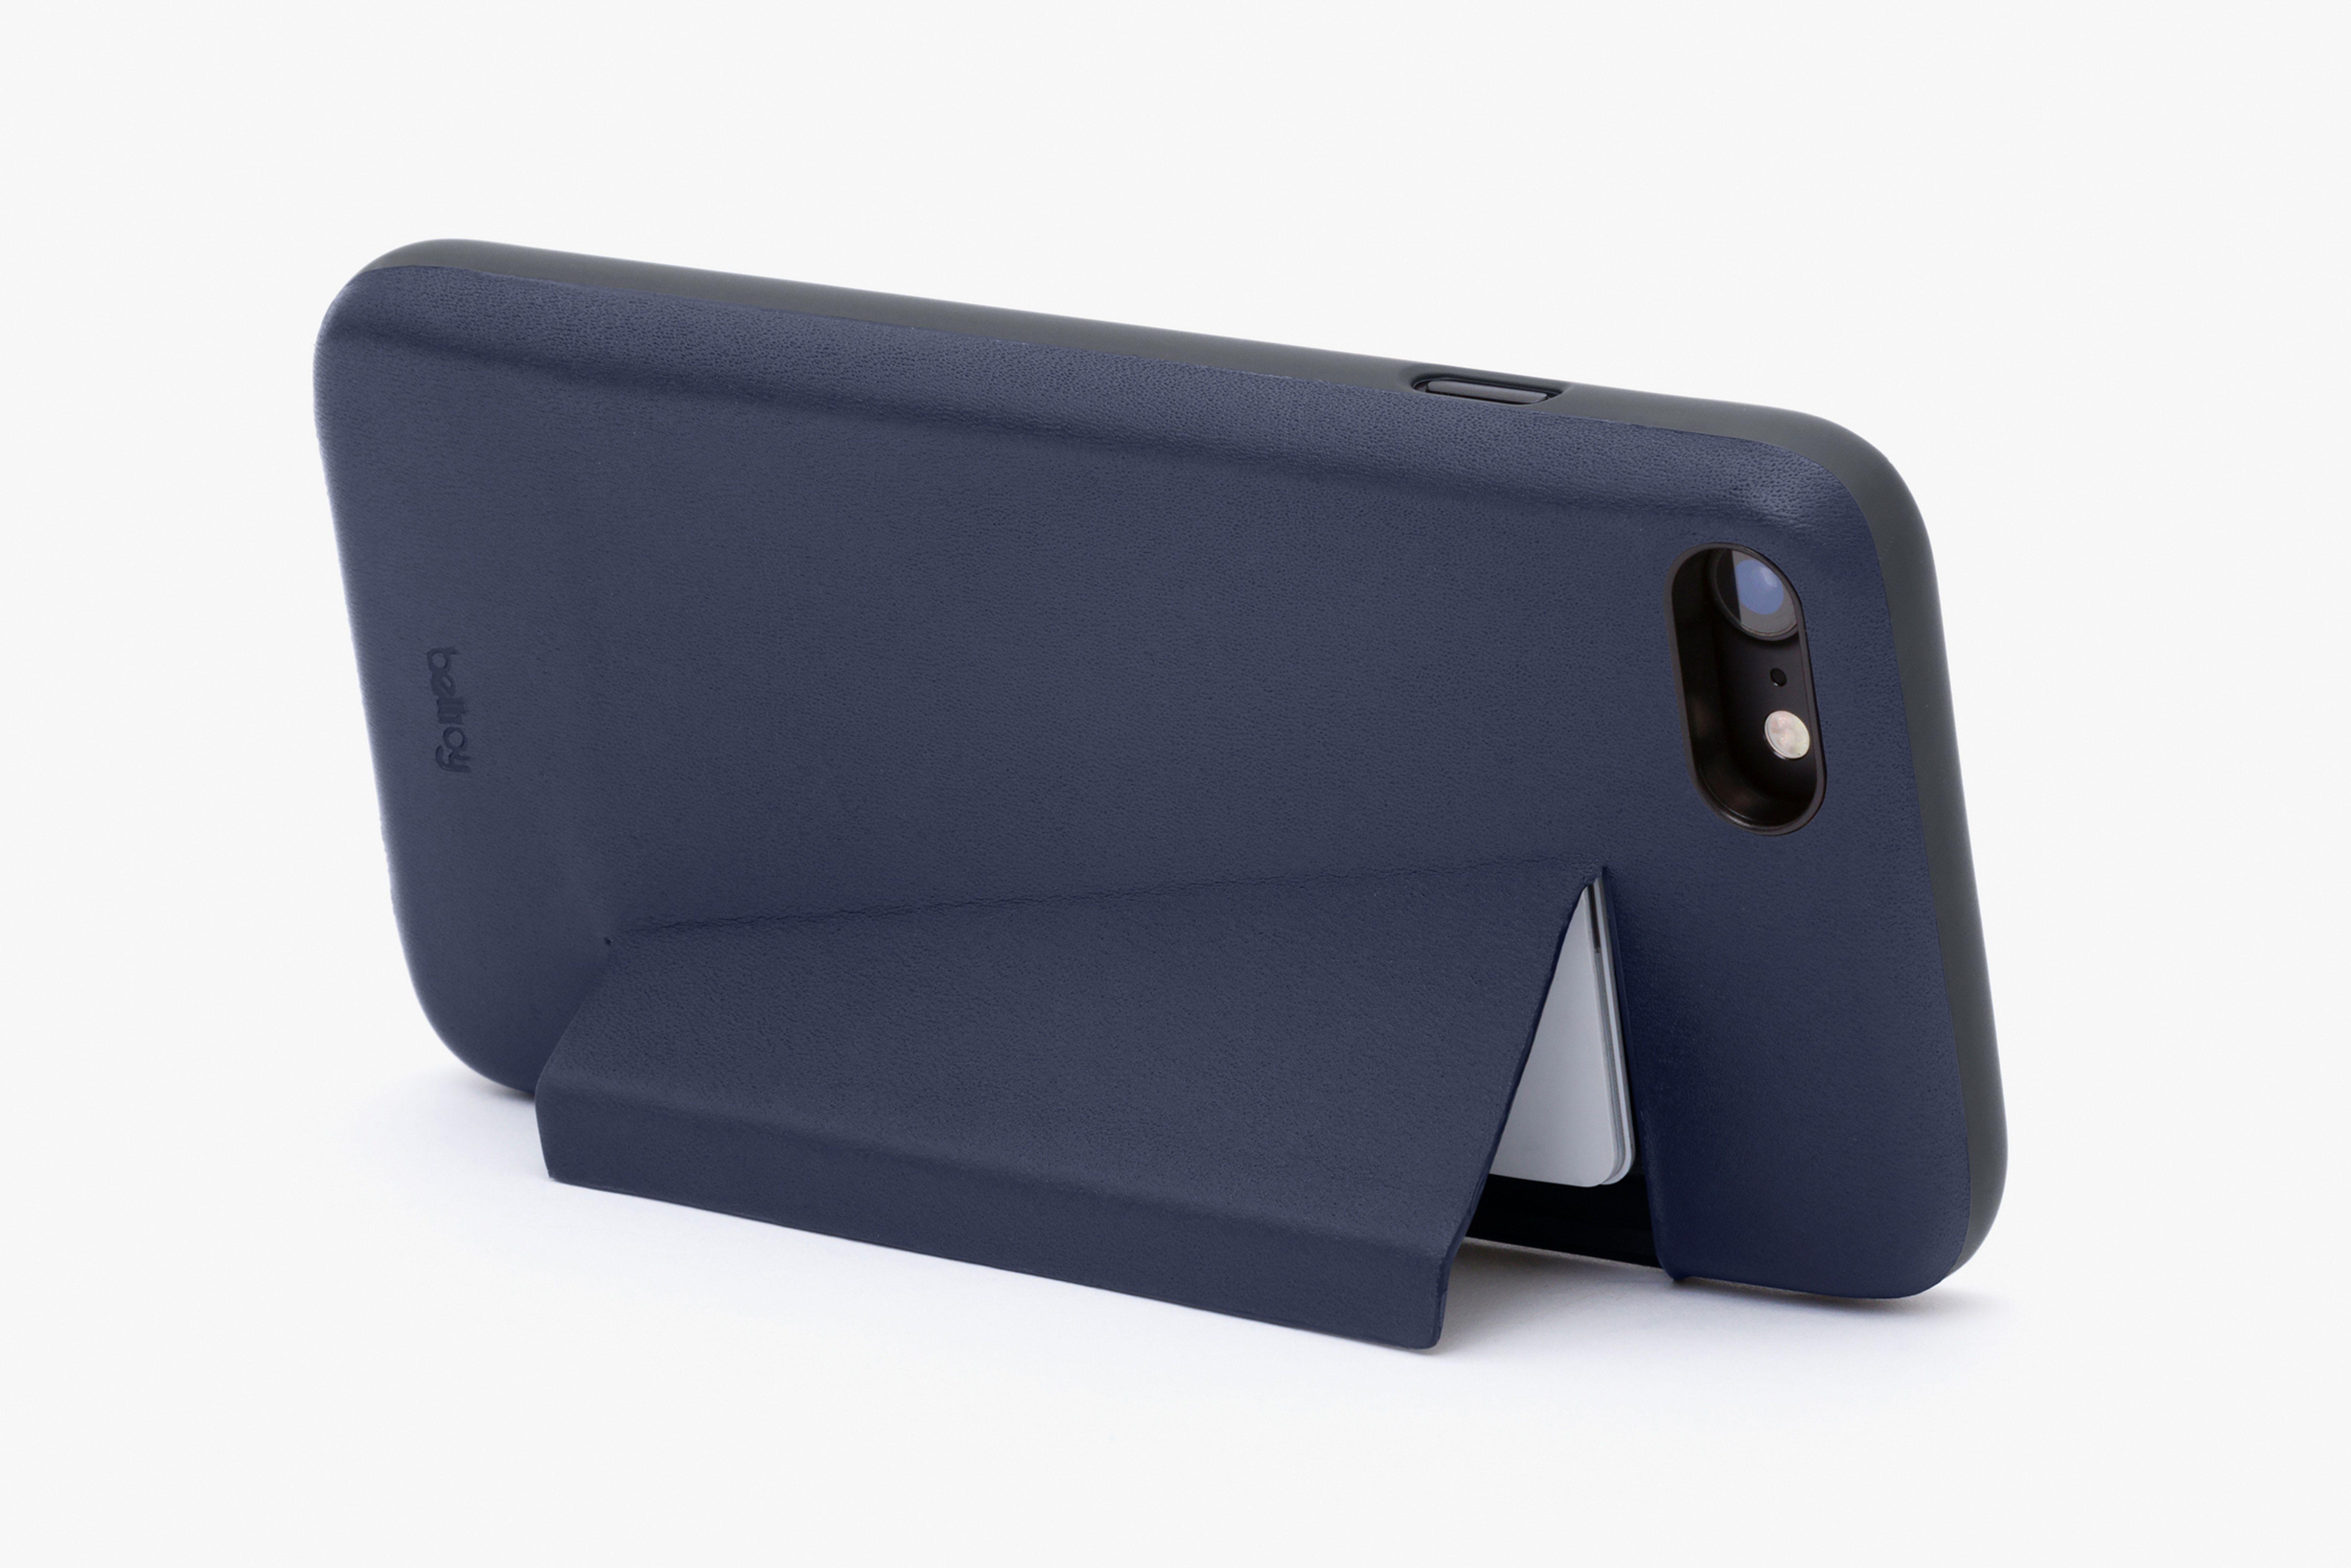 bellroy iphone 7 case